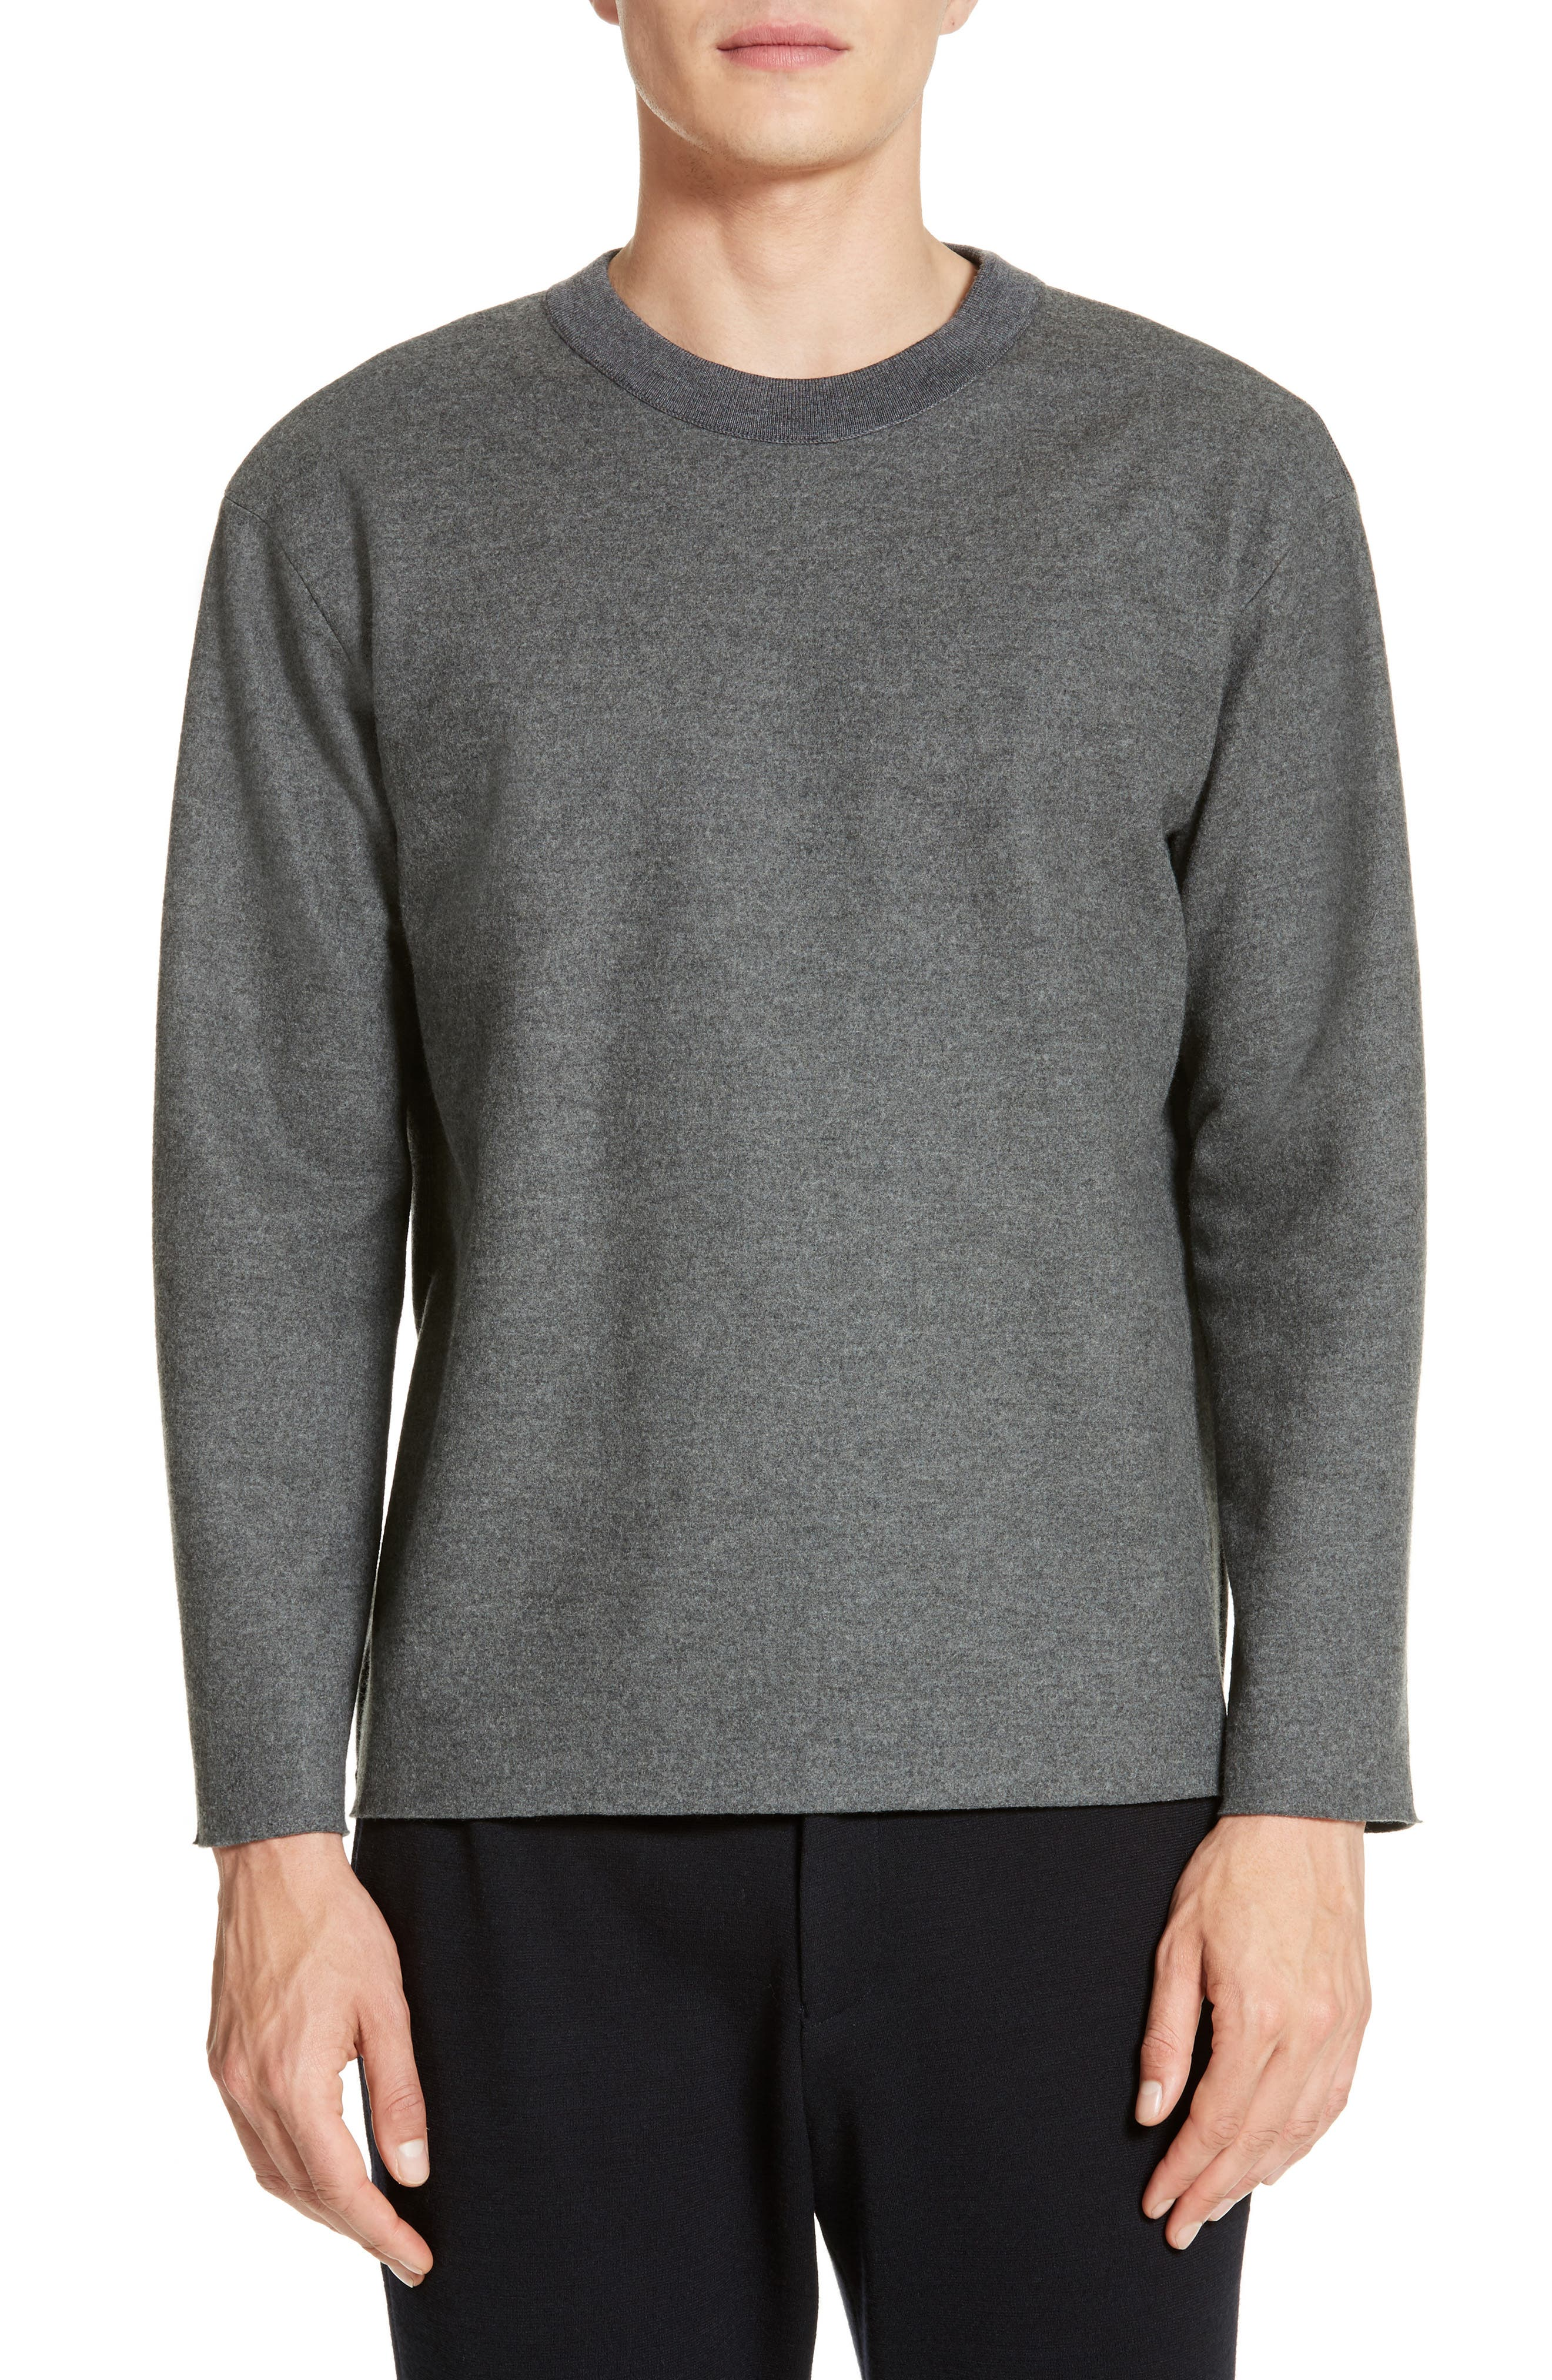 Hyper Compress Sweatshirt,                             Main thumbnail 1, color,